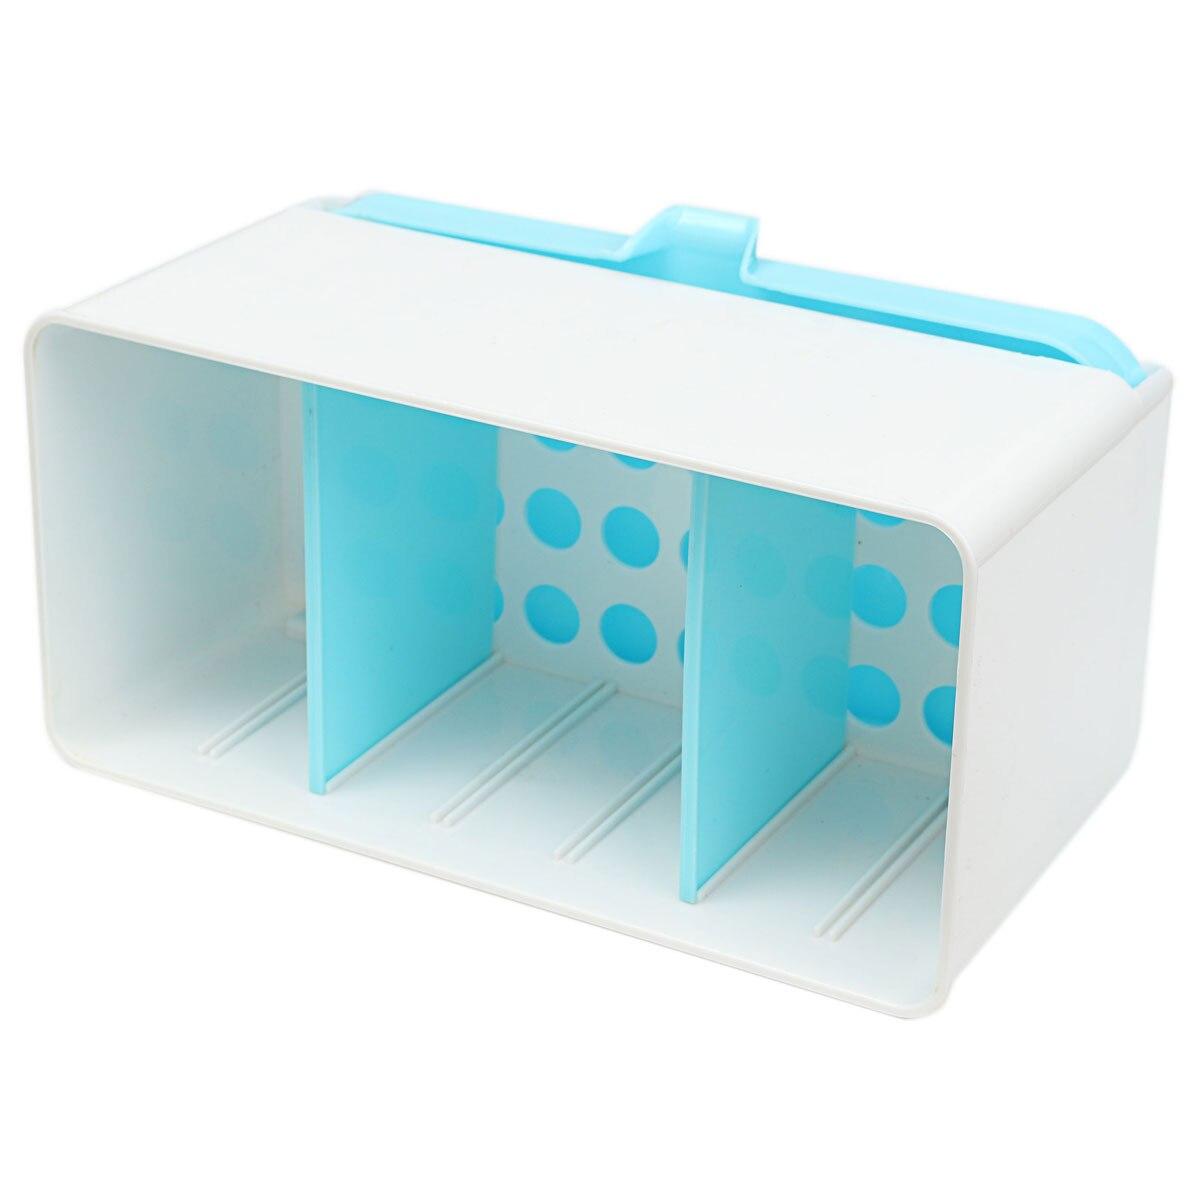 Wash Dry Shelf Drainer Sink Tidy Organiser Utensils Kitchen Storage Organizer Cutlery Holder Rack Caddy Sponge Basket on Aliexpress.com | Alibaba ...